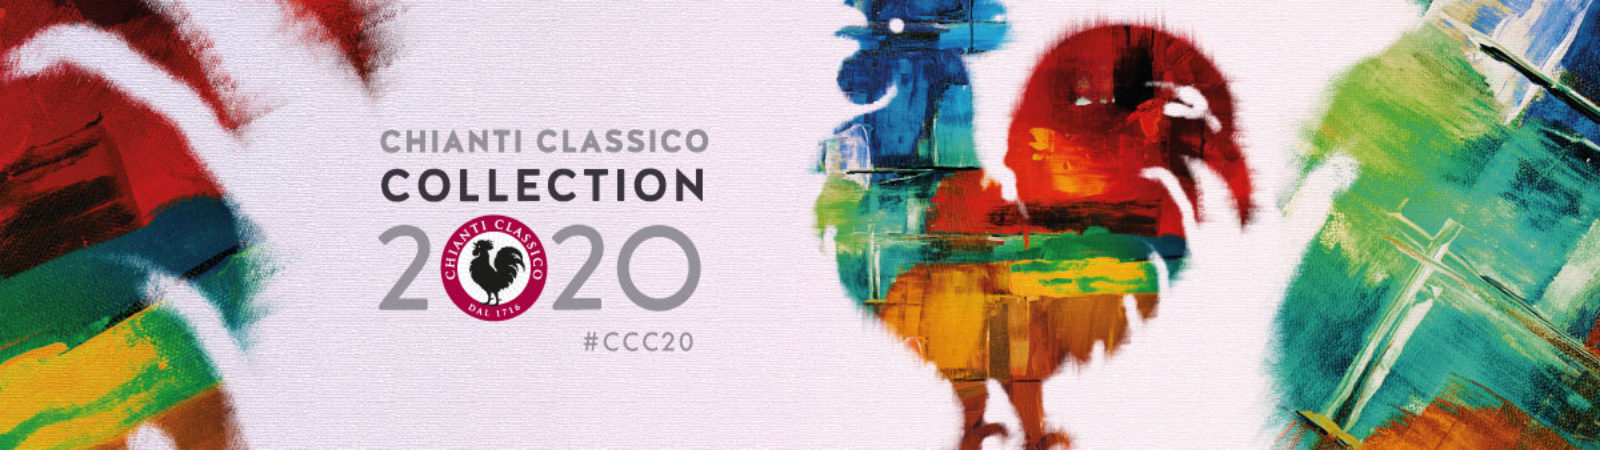 chianticlassicocollection-2020-1